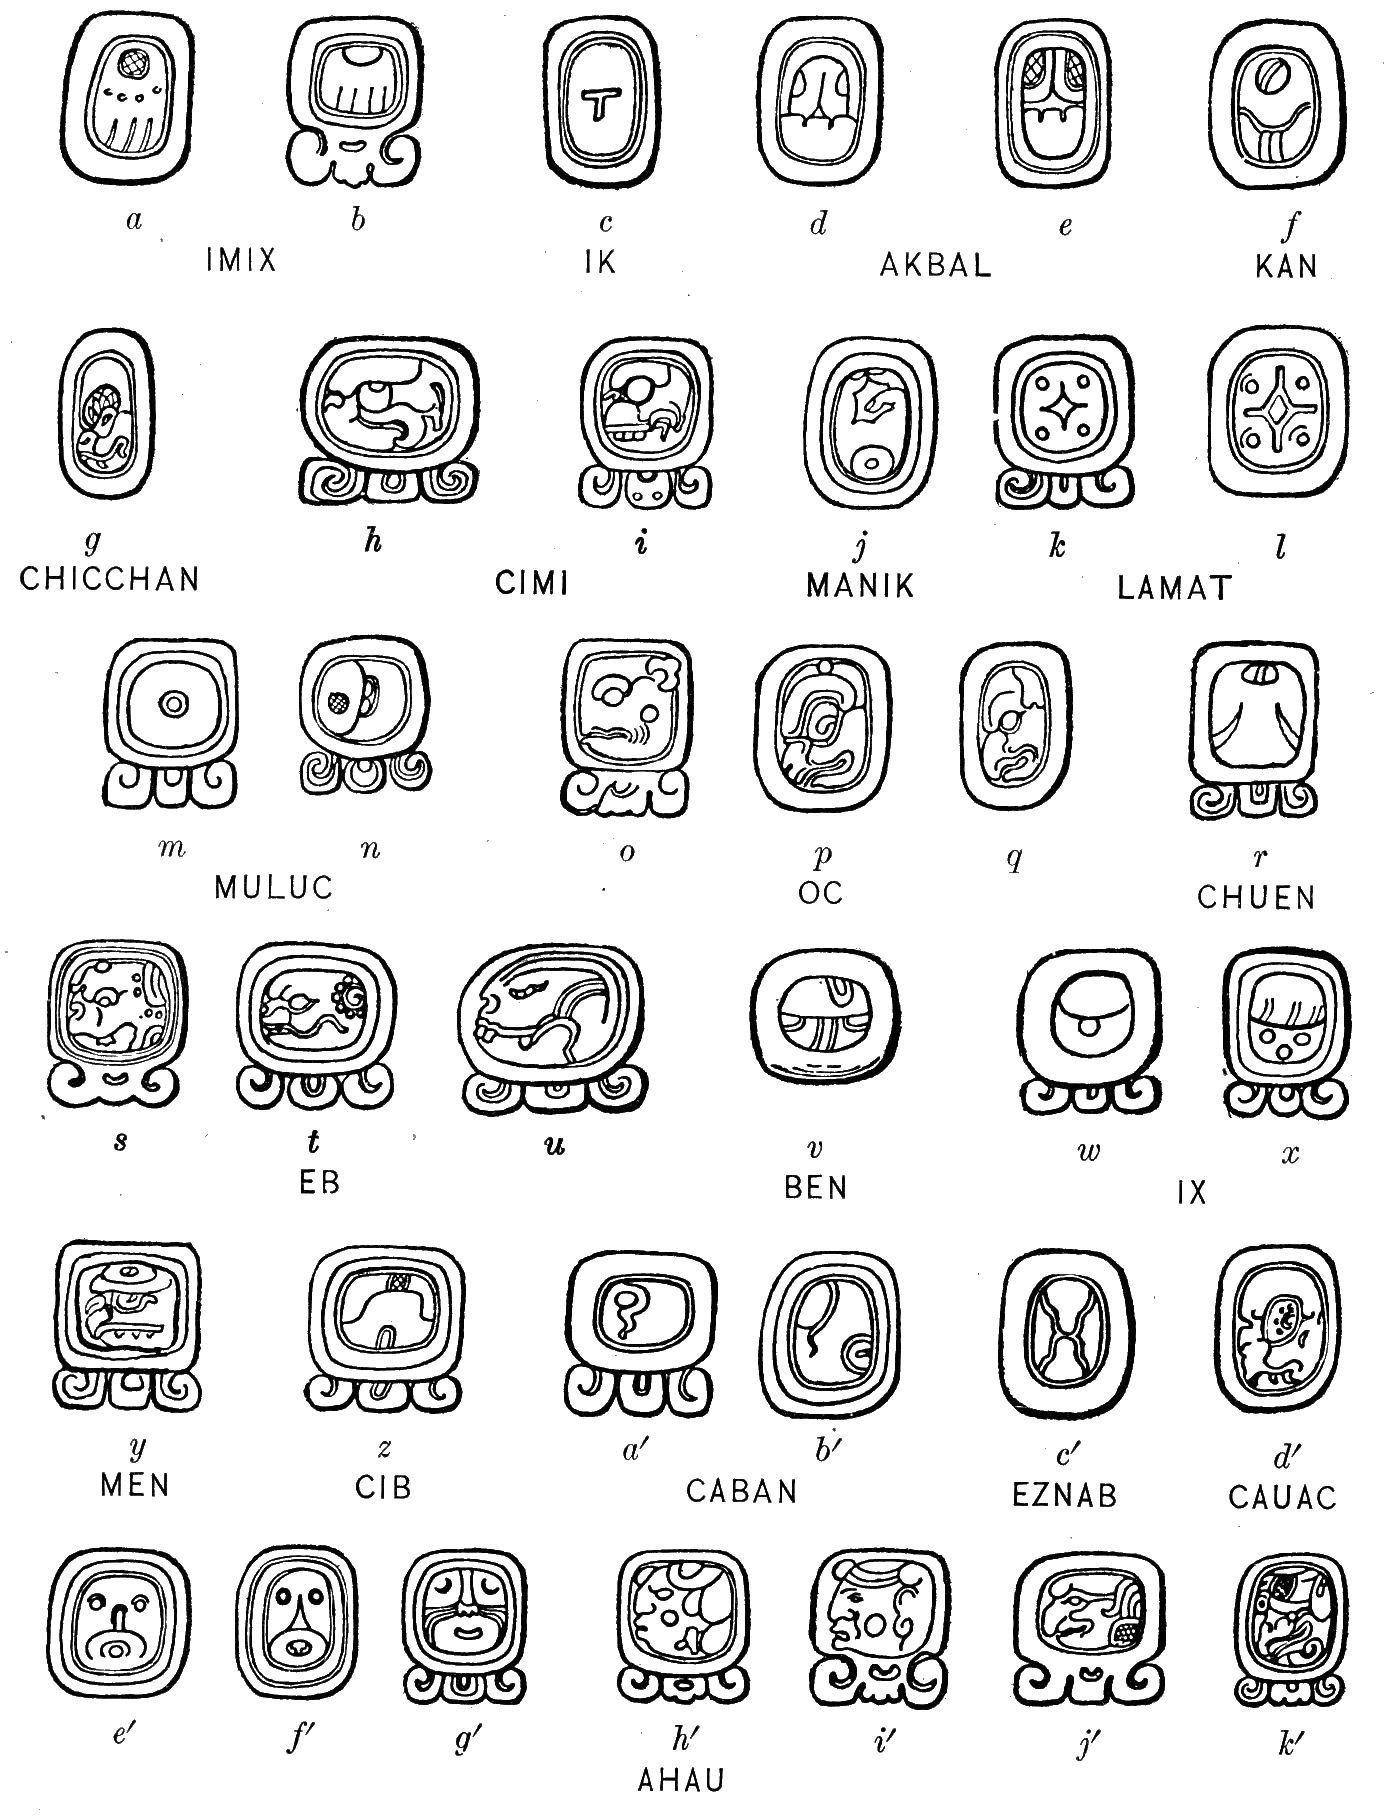 The man who deciphered Maya writing